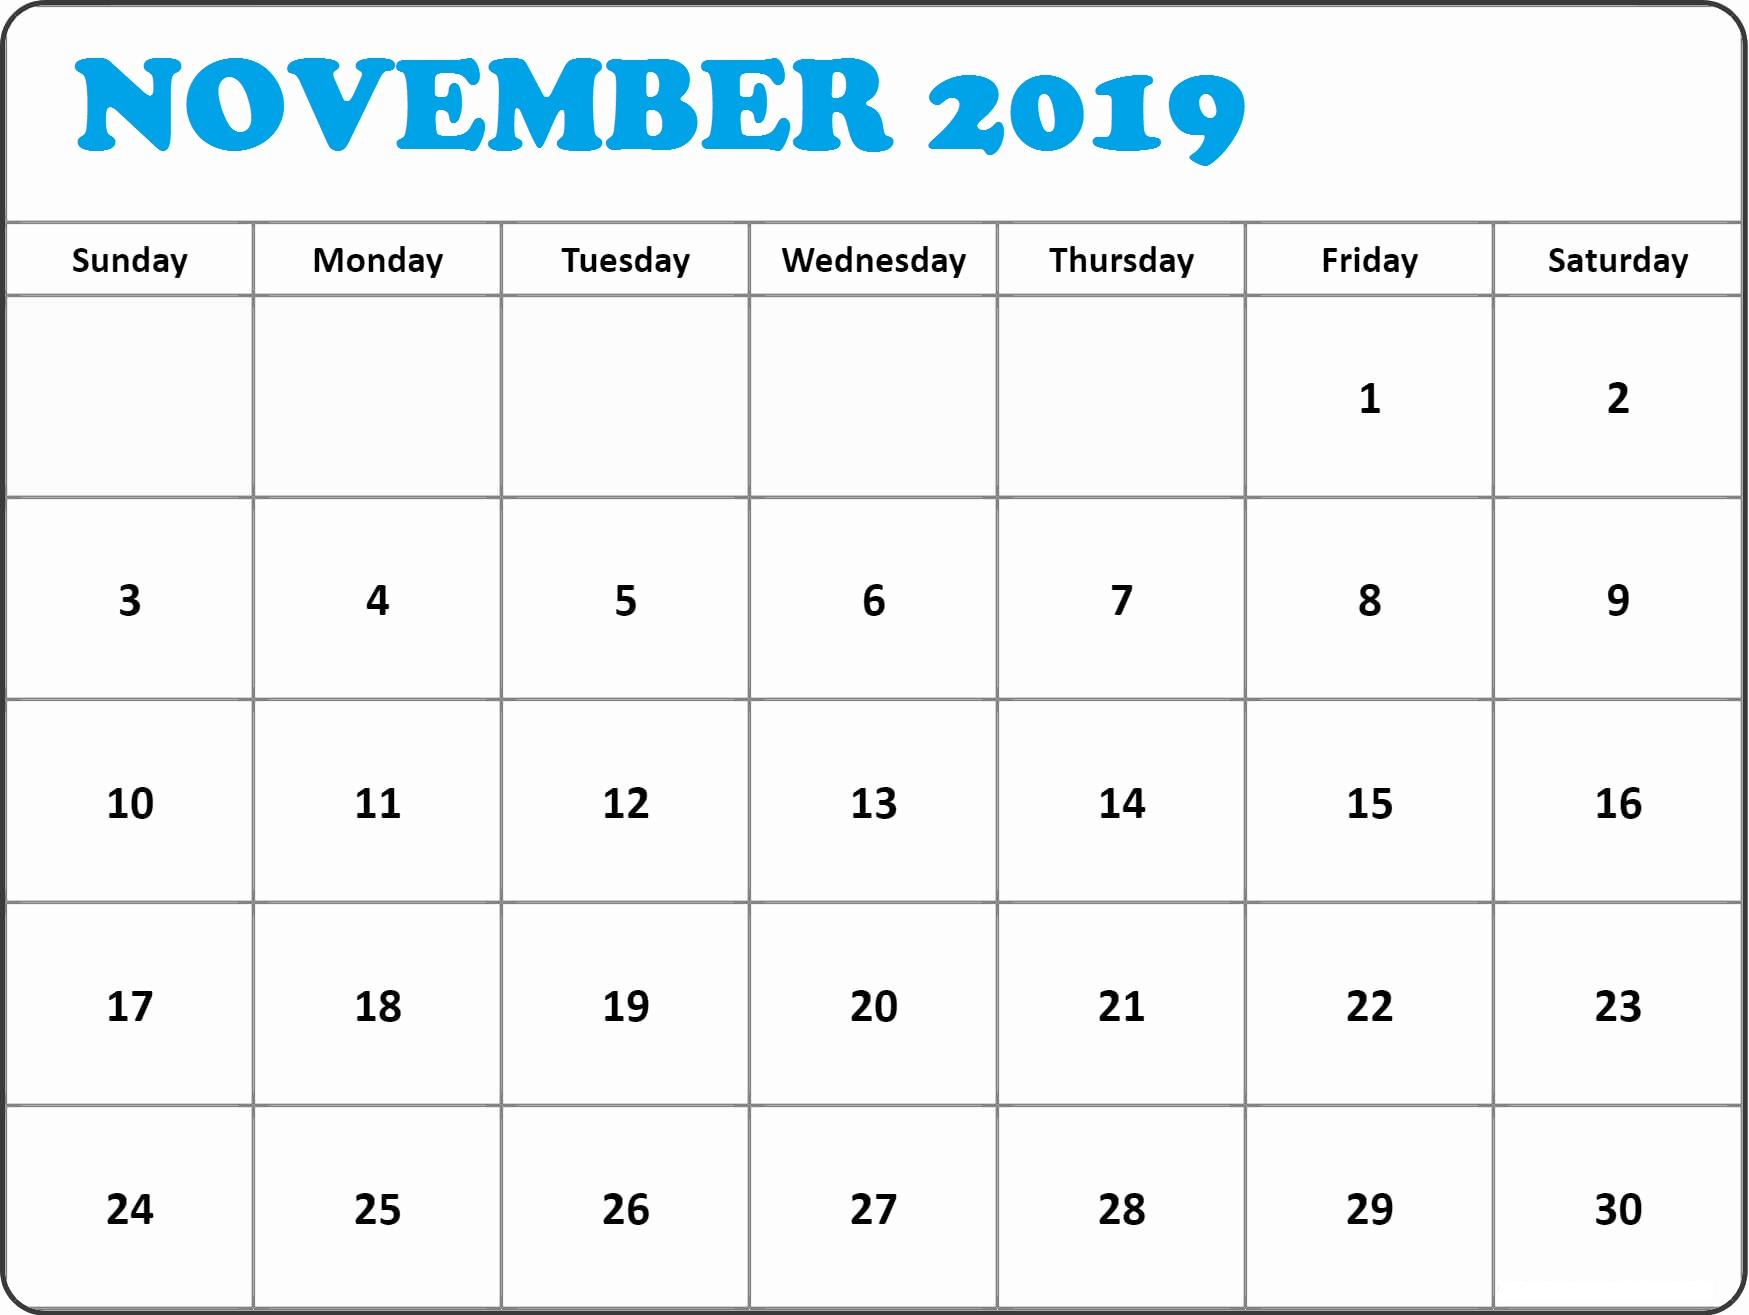 November 2019 Calendar Printable Decorative